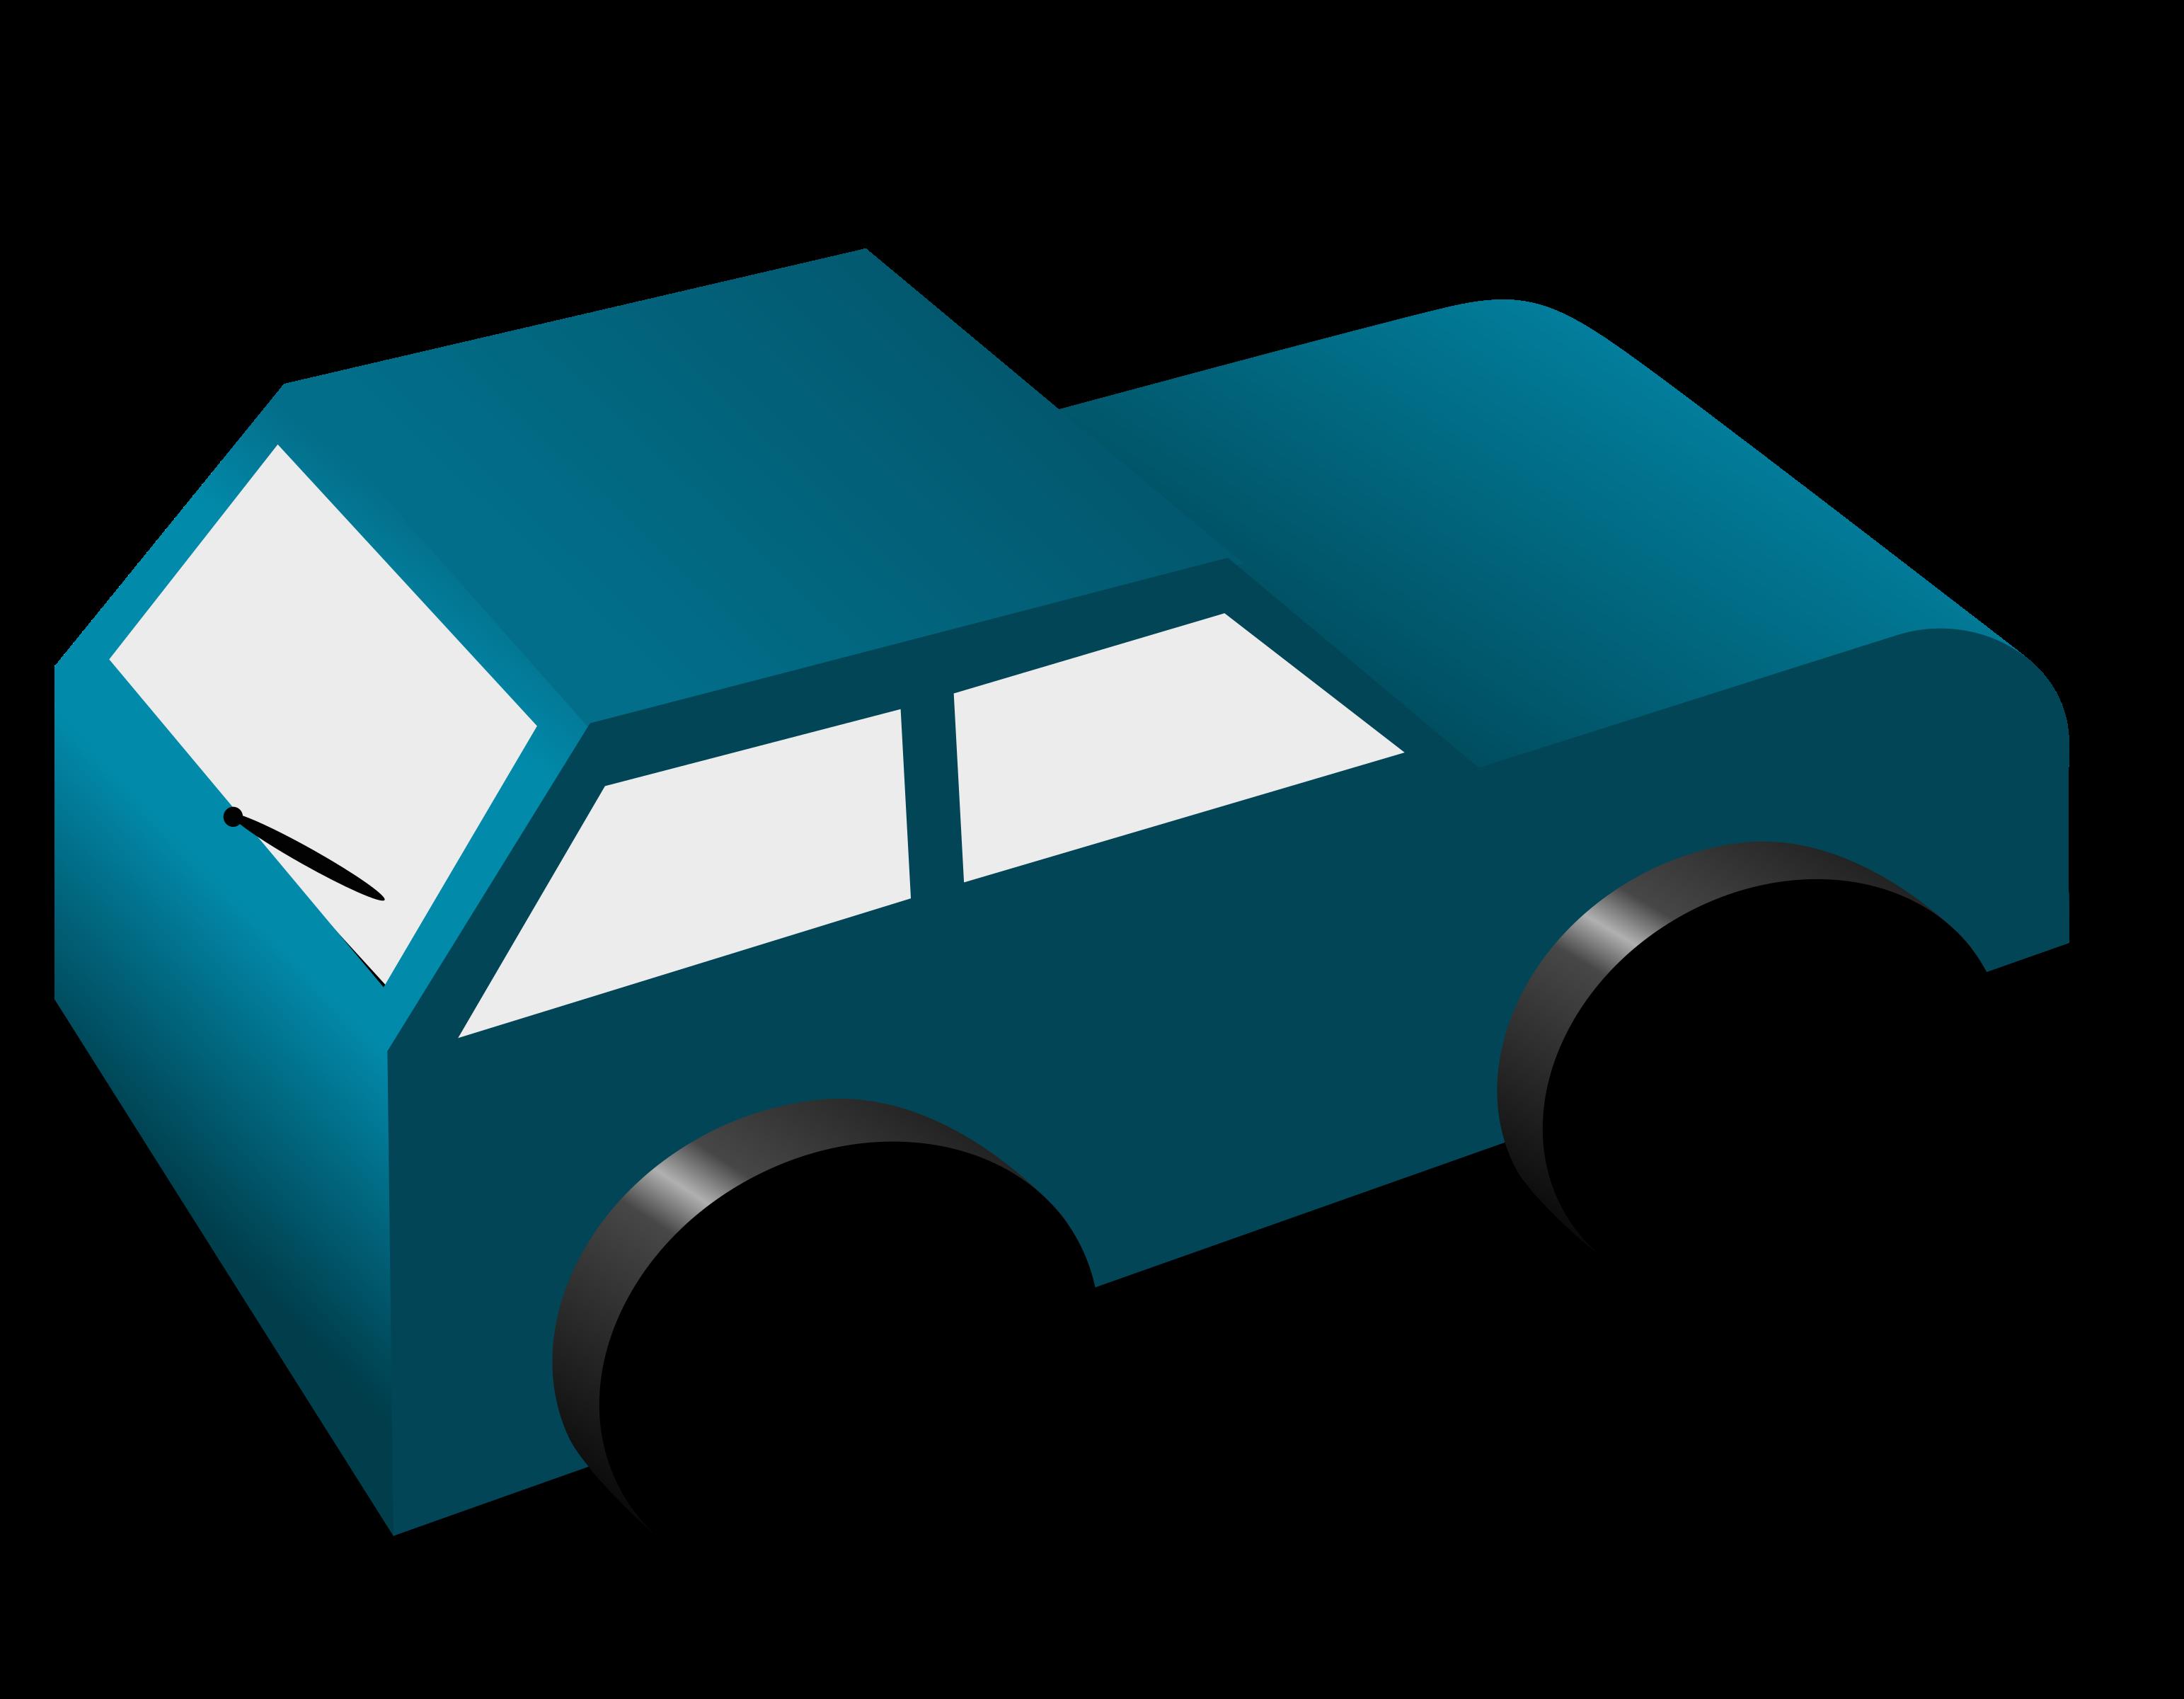 Cartoon car clipart clipart library download Clipart - cartoon car back clipart library download